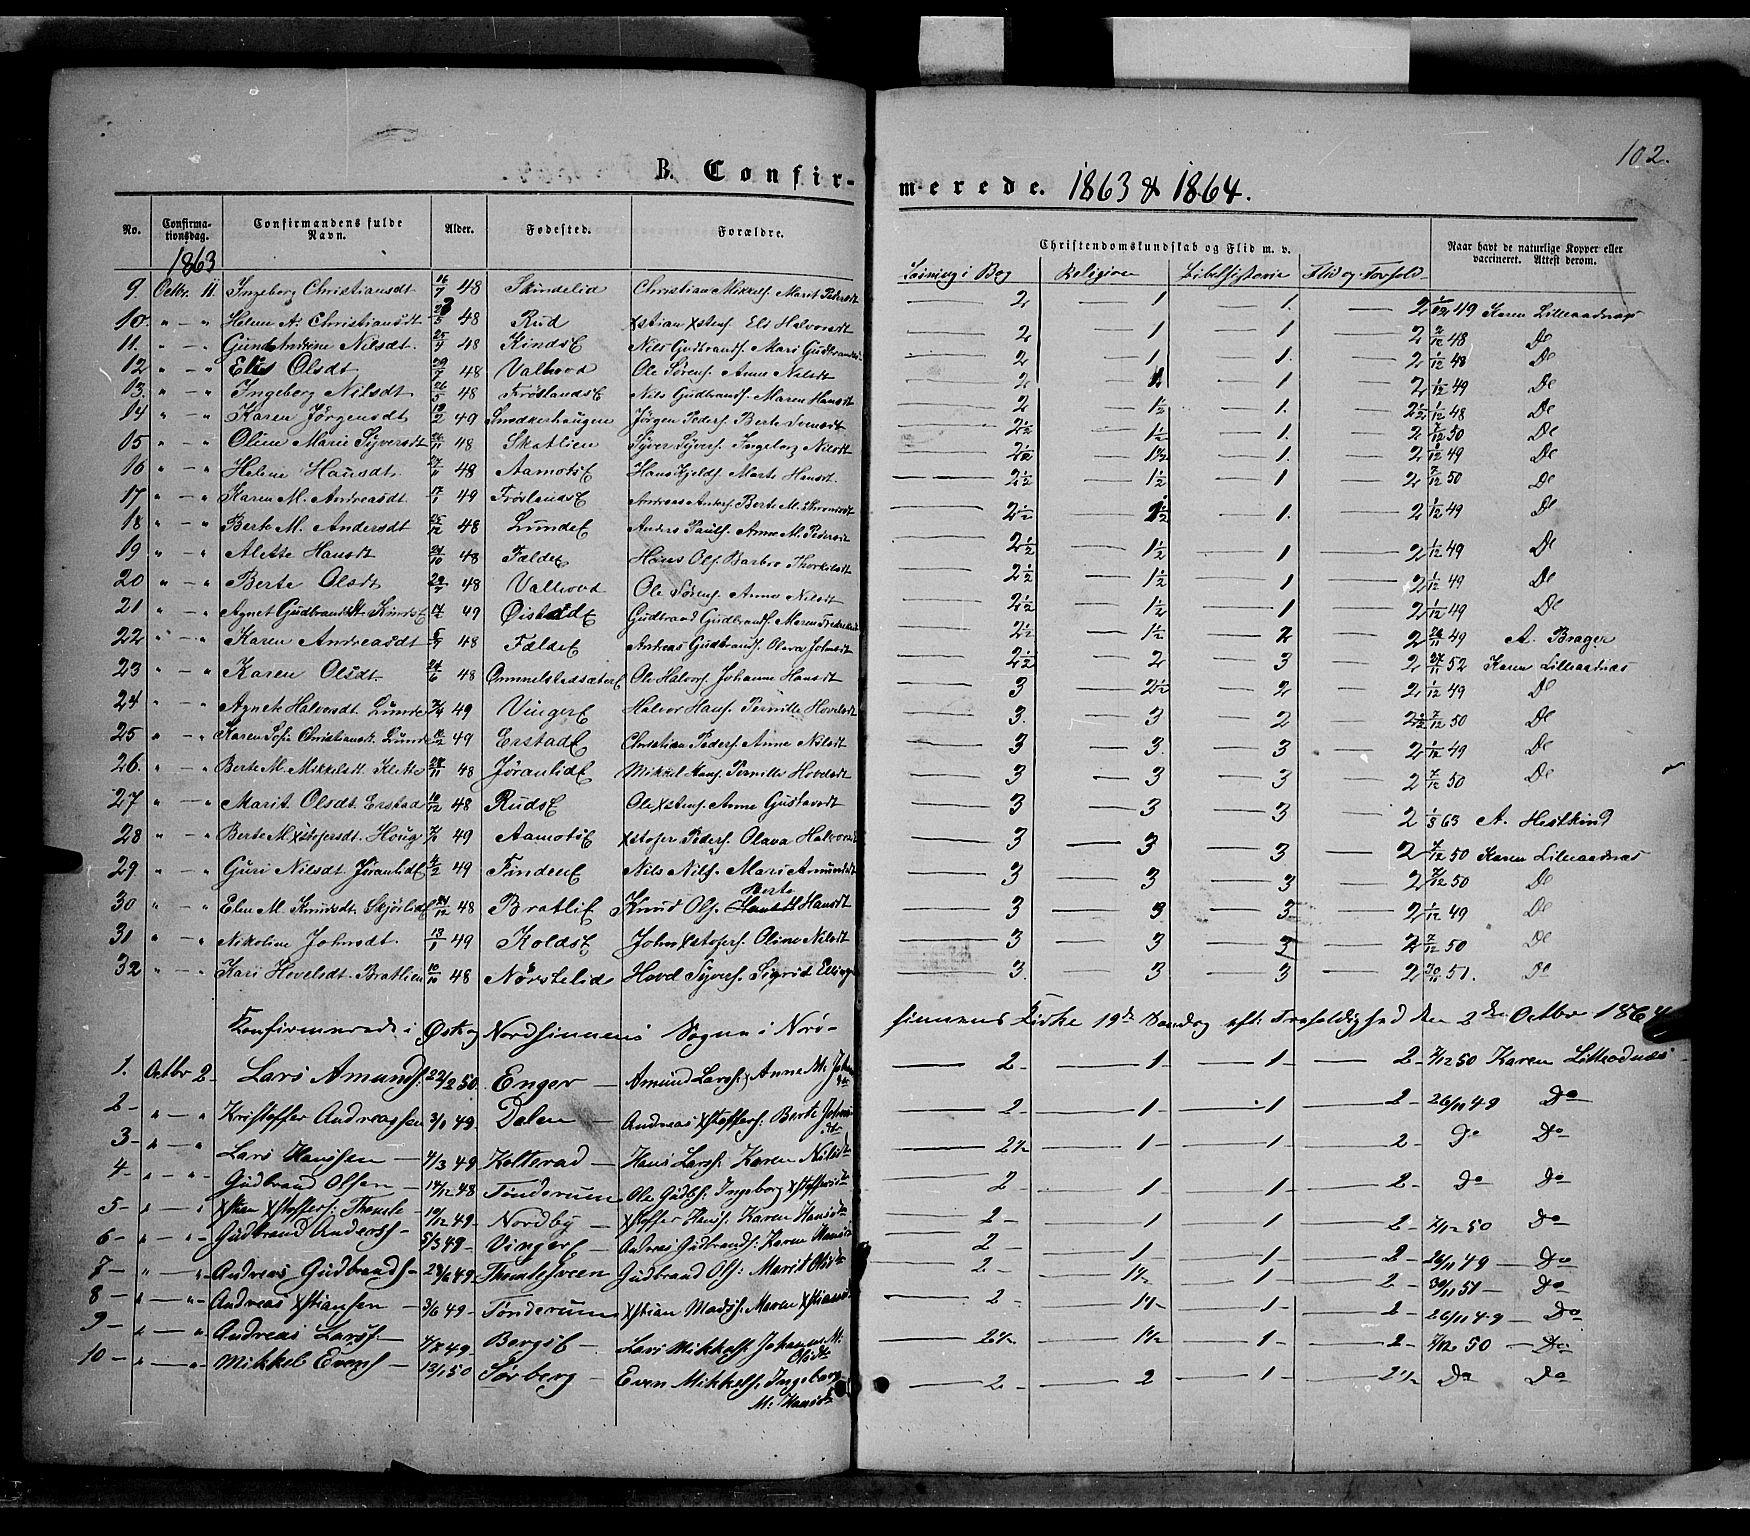 SAH, Nordre Land prestekontor, Ministerialbok nr. 1, 1860-1871, s. 102